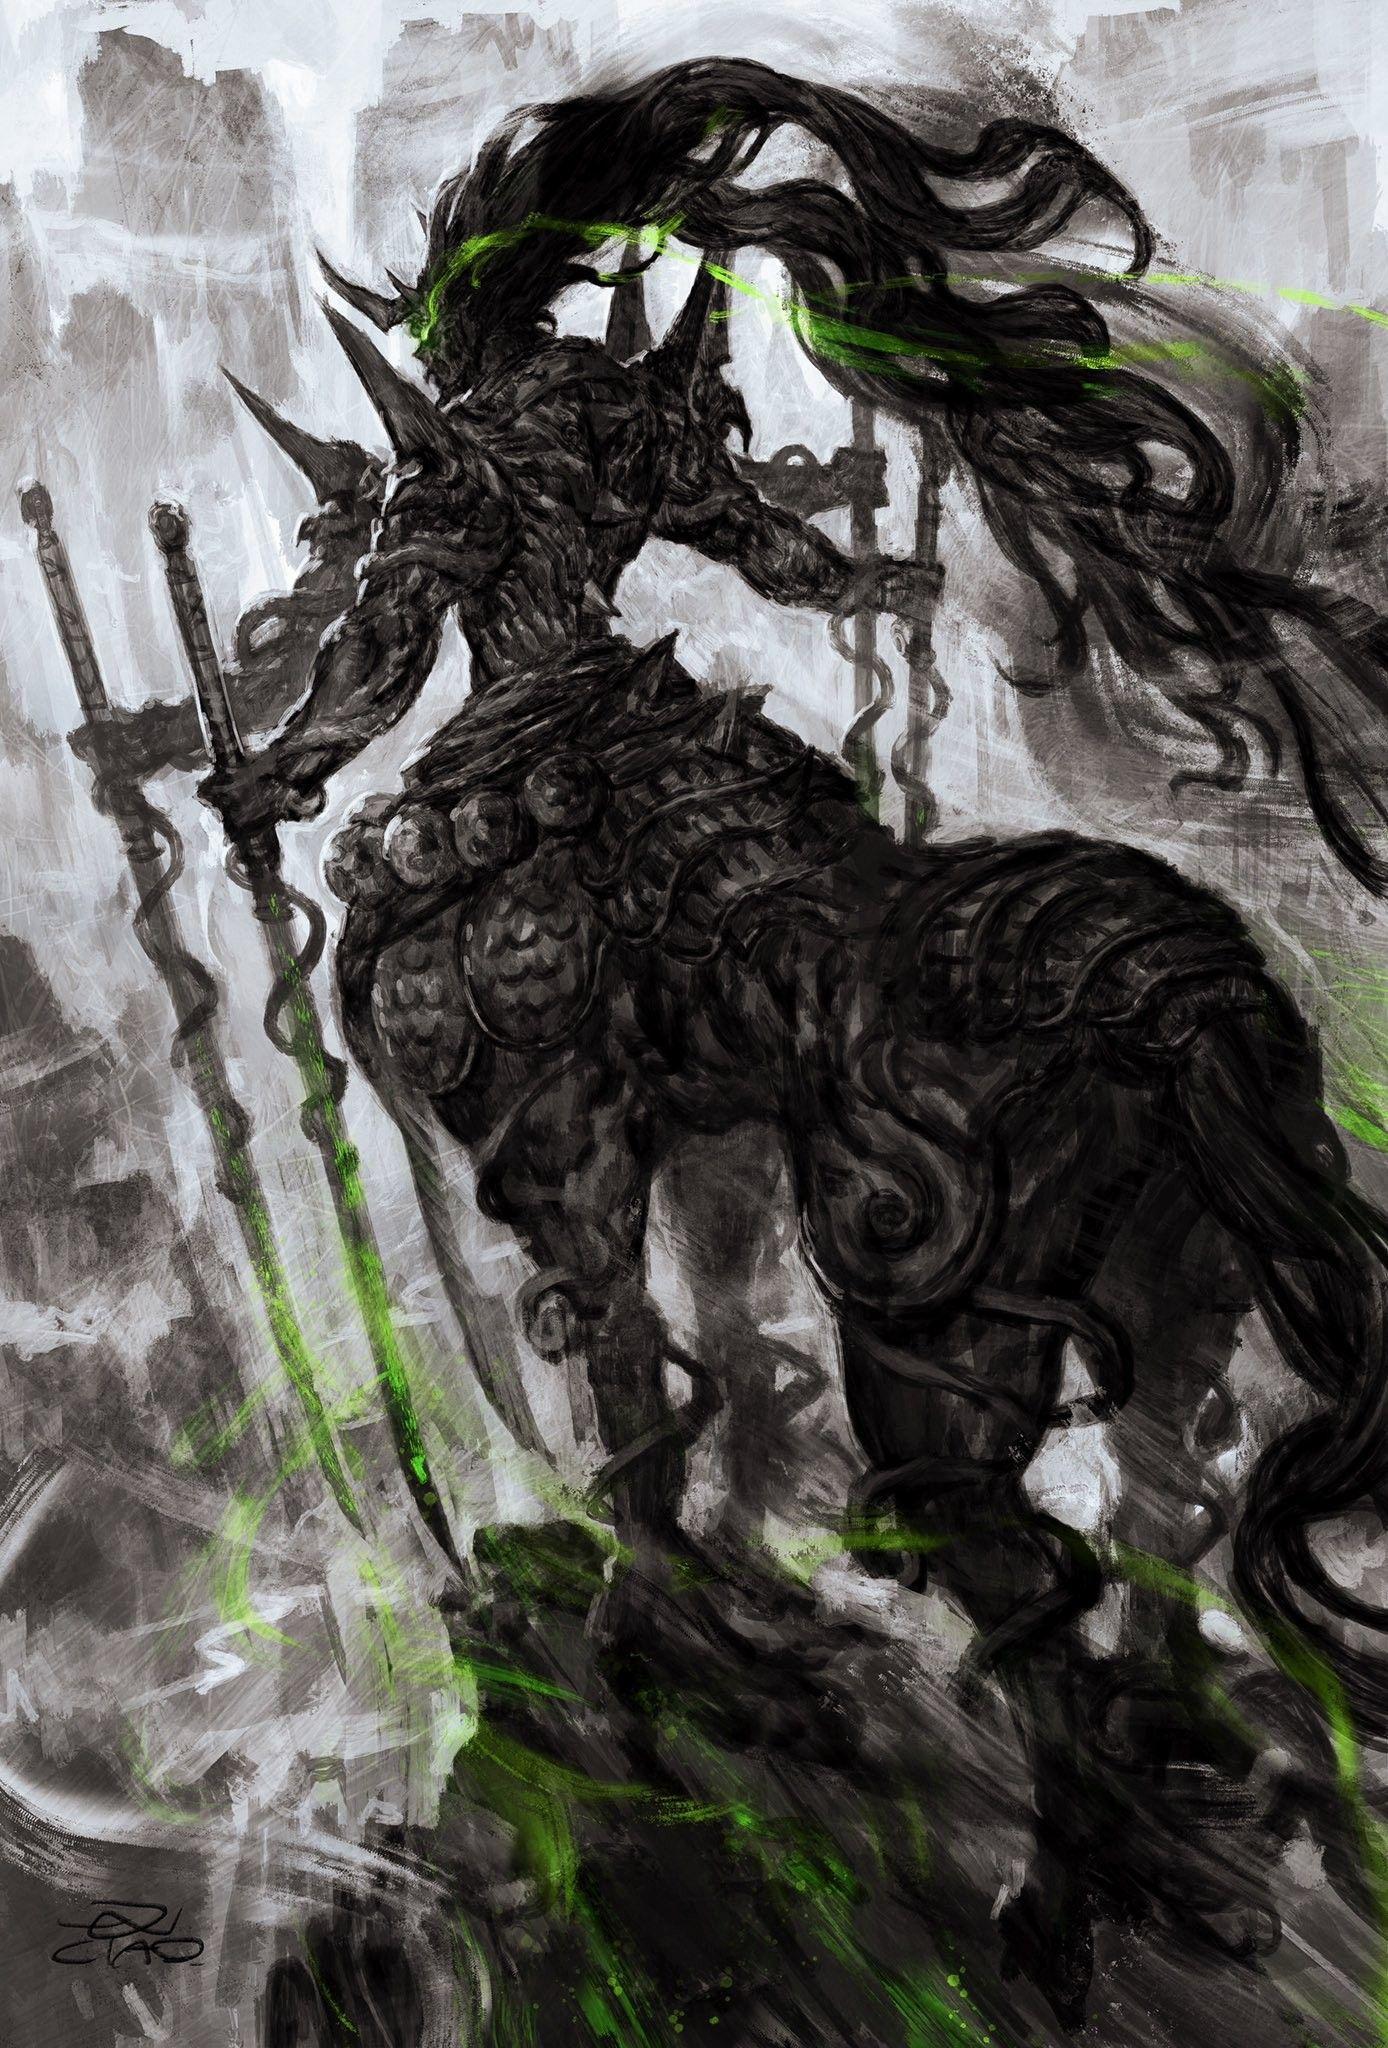 Fate/Neverwinter Night's (Fate Grand Order/Forgotten Realms